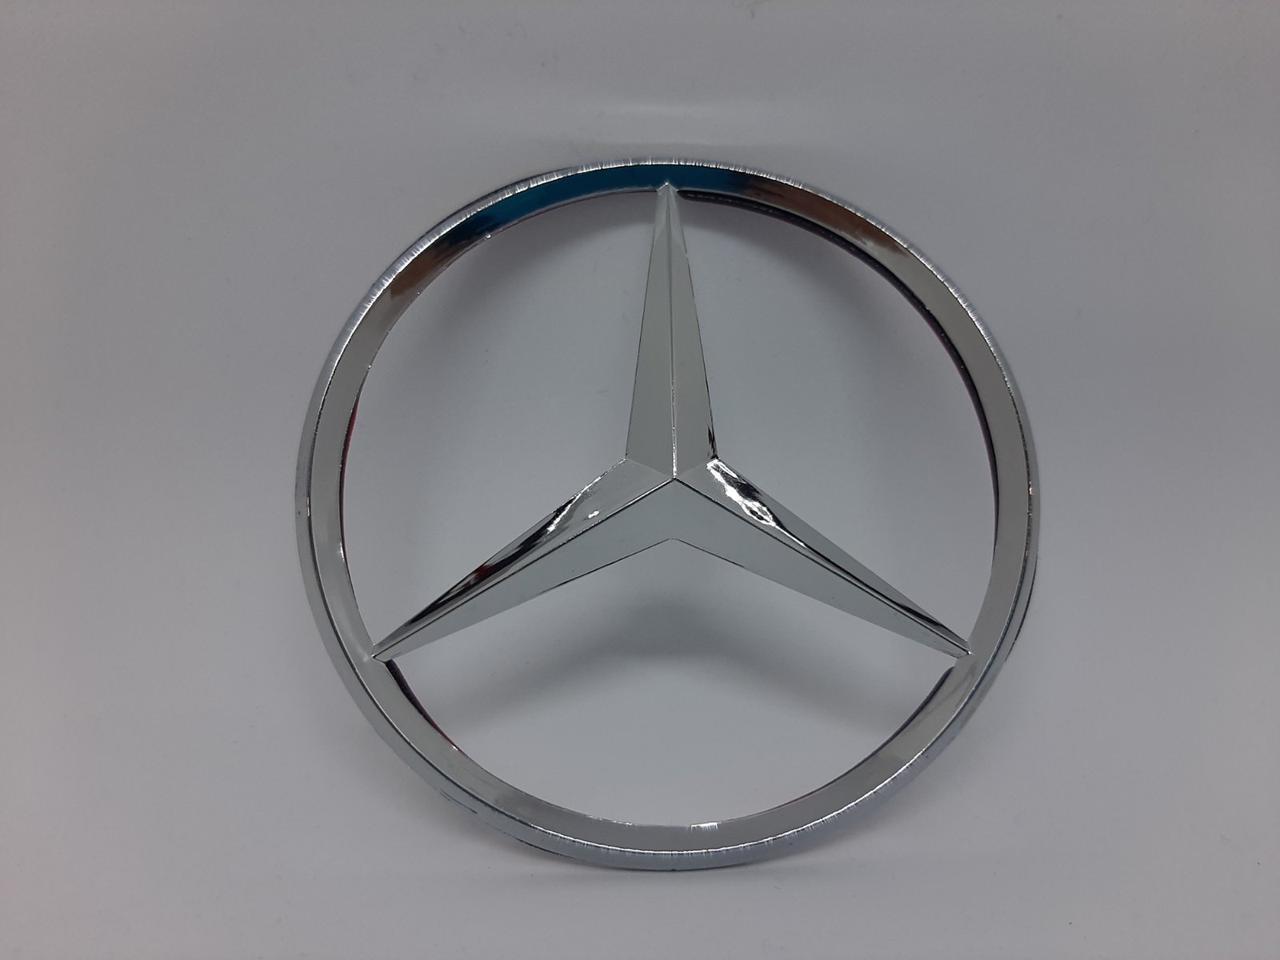 Емблема, логотип значок Mercedes-Benz на кришку багажника і капот